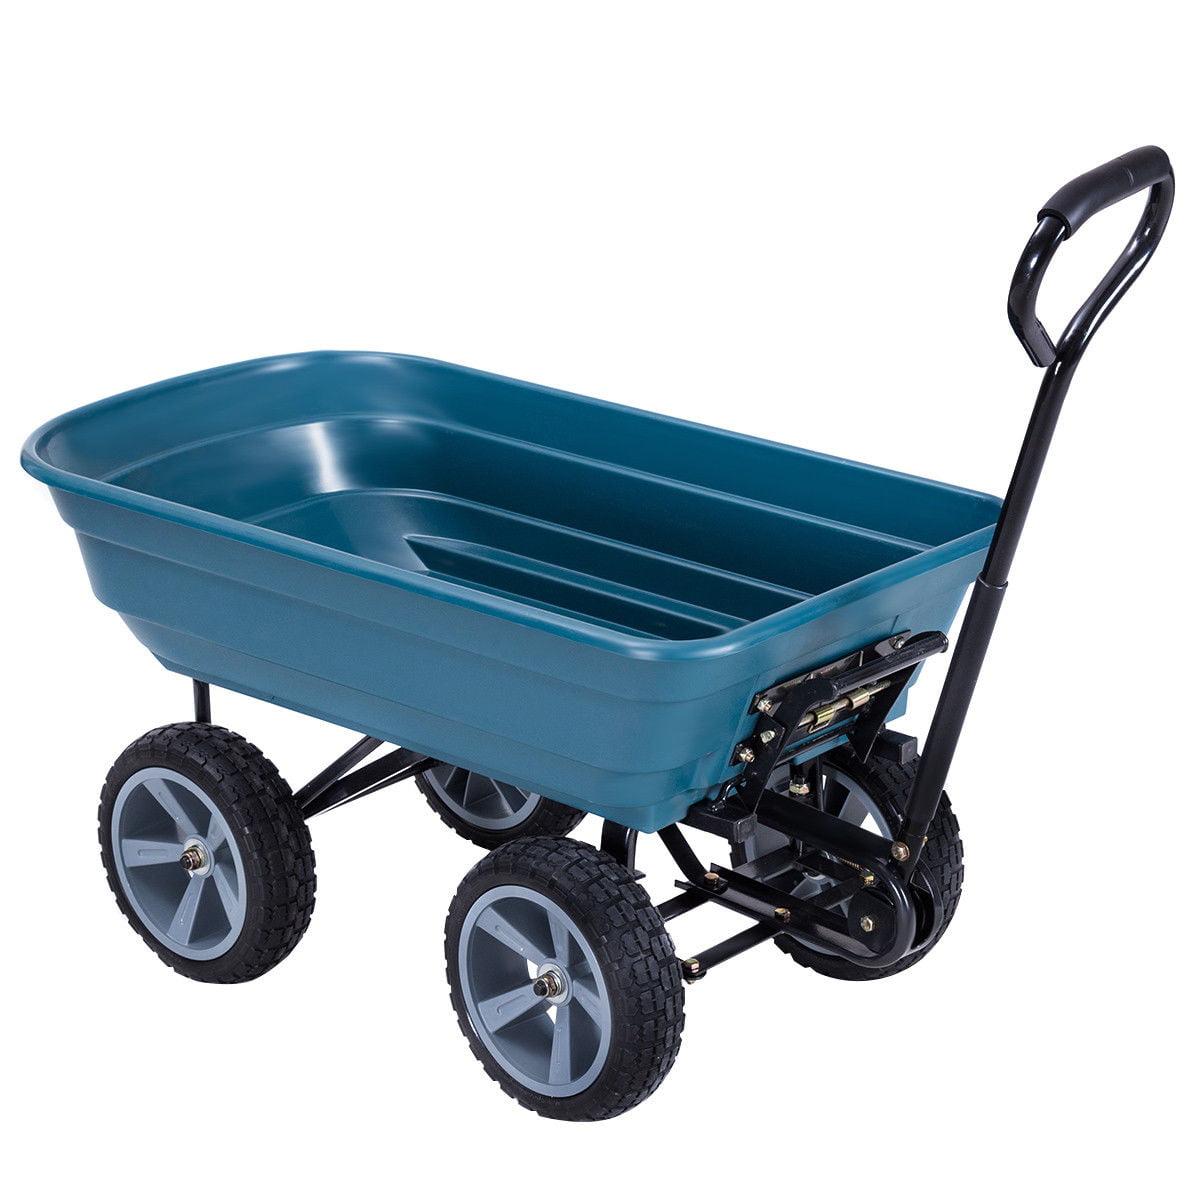 GHP 440-Lbs Capacity Blue Steel Garden Dump Cart Wagon with Rubber Pneumatic Wheels